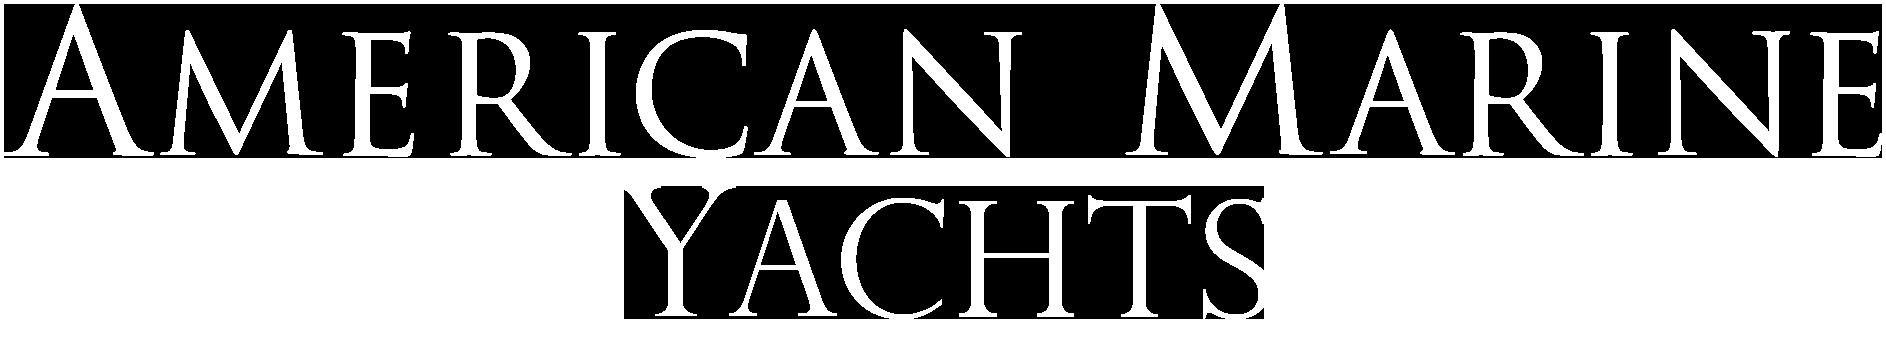 American Marine Yachts logo